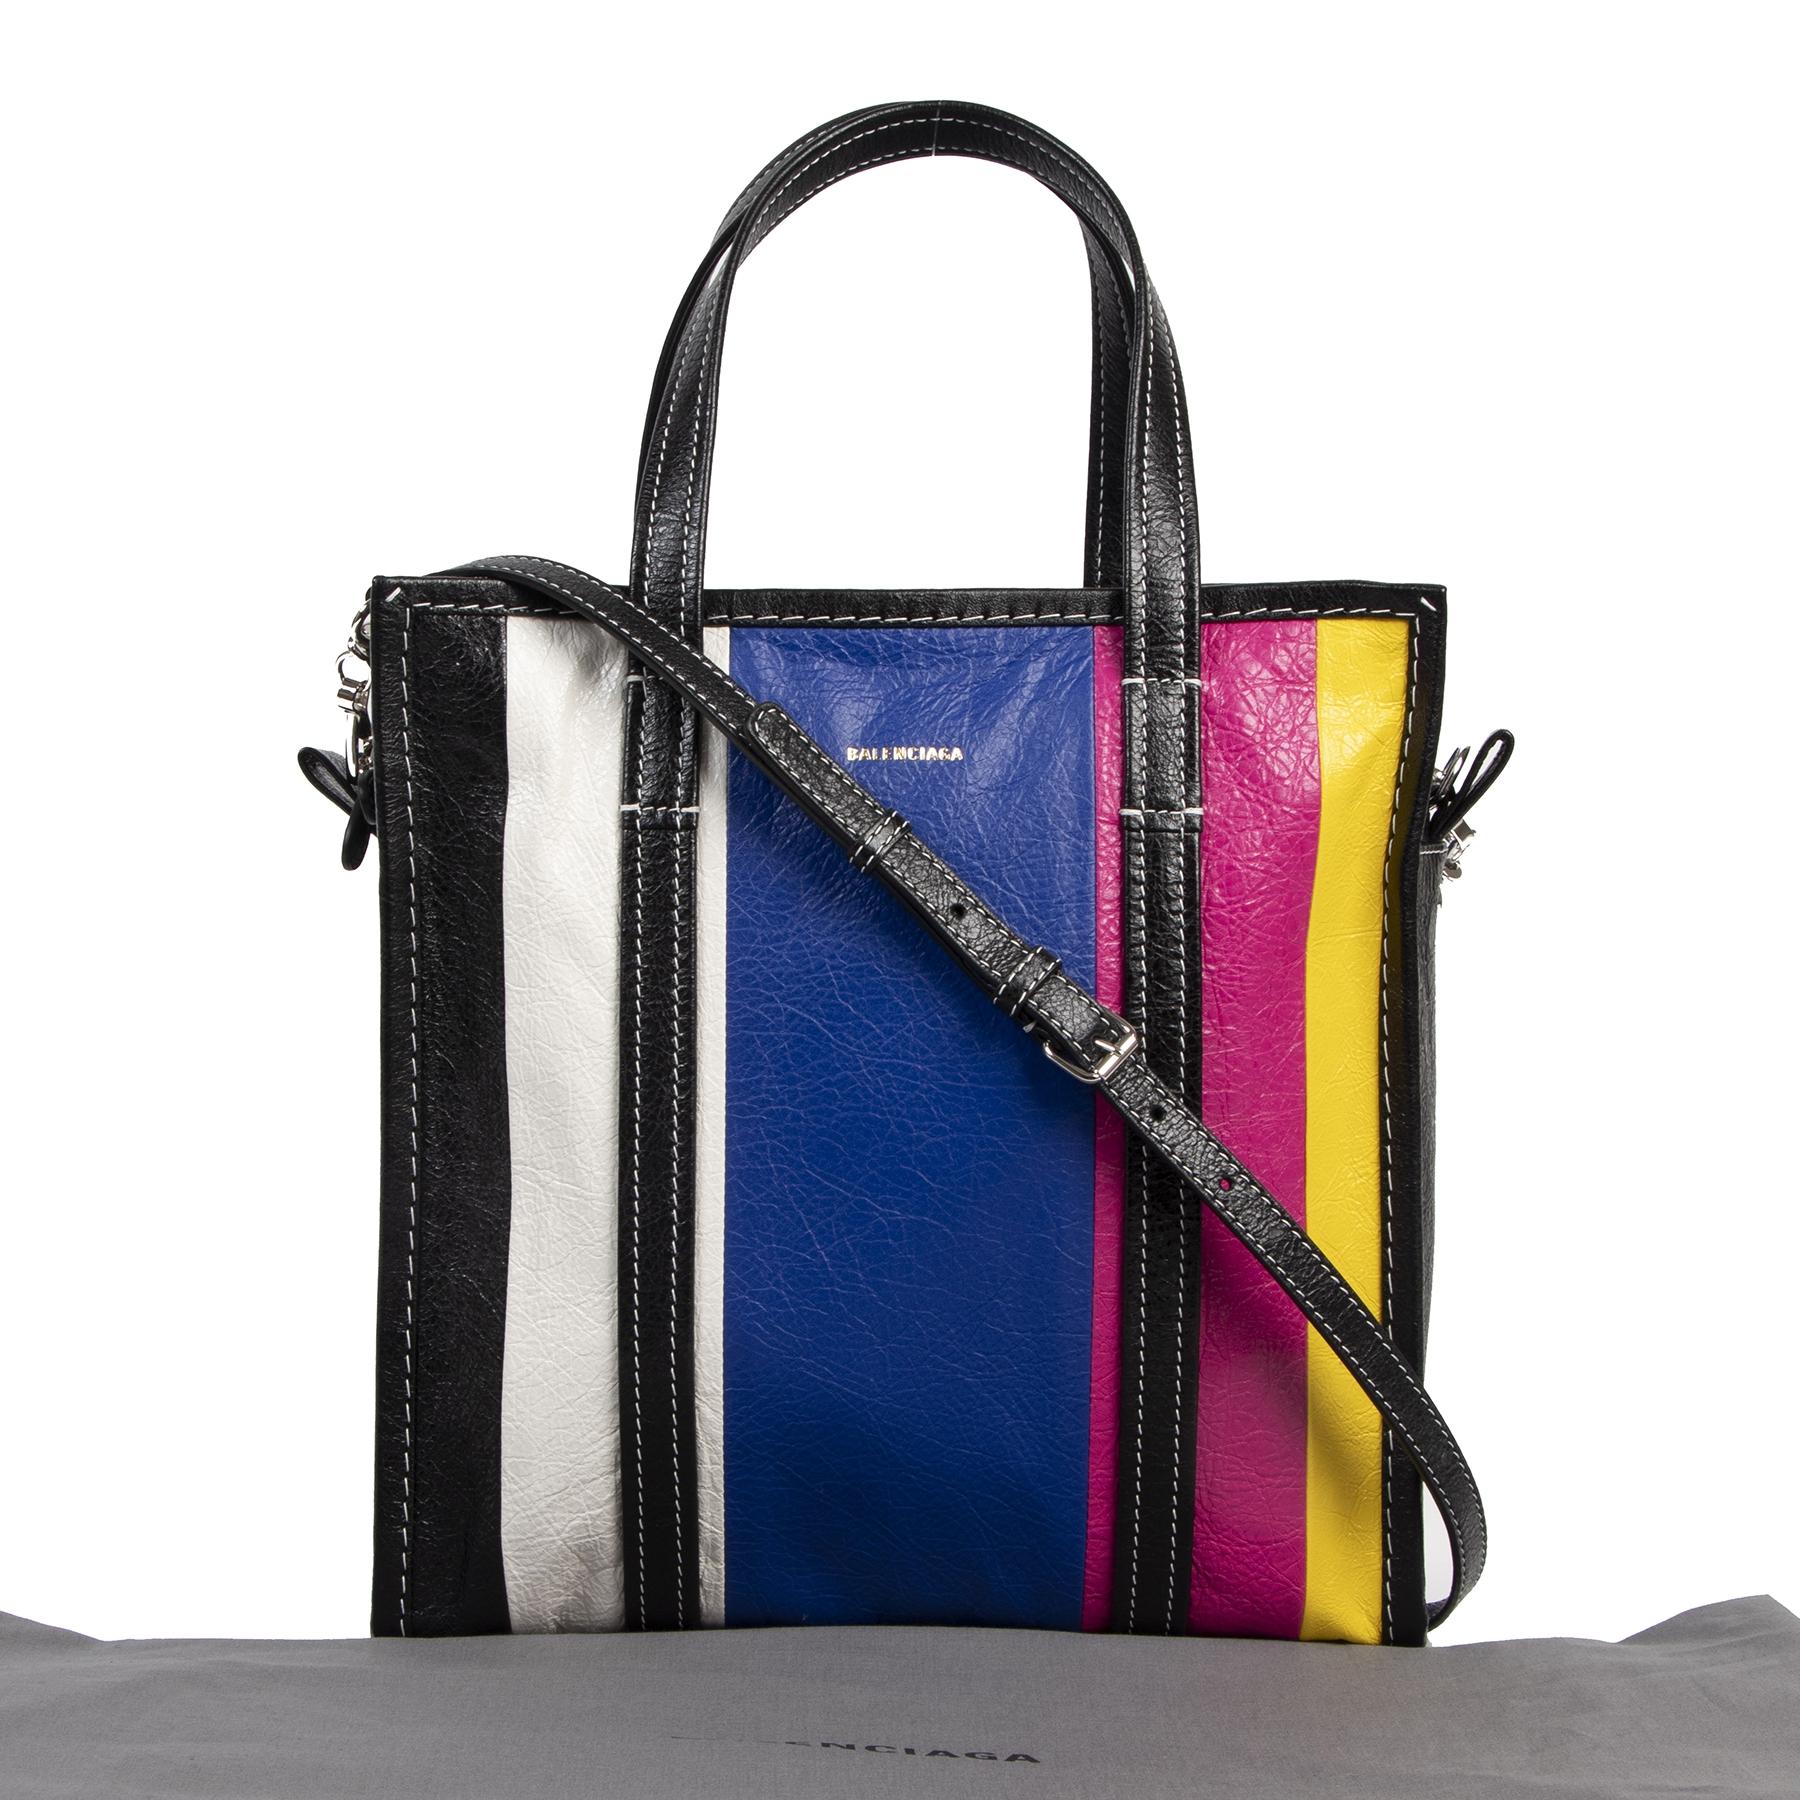 koop veilig online Balenciaga Striped Bazaar S Leather Shopper